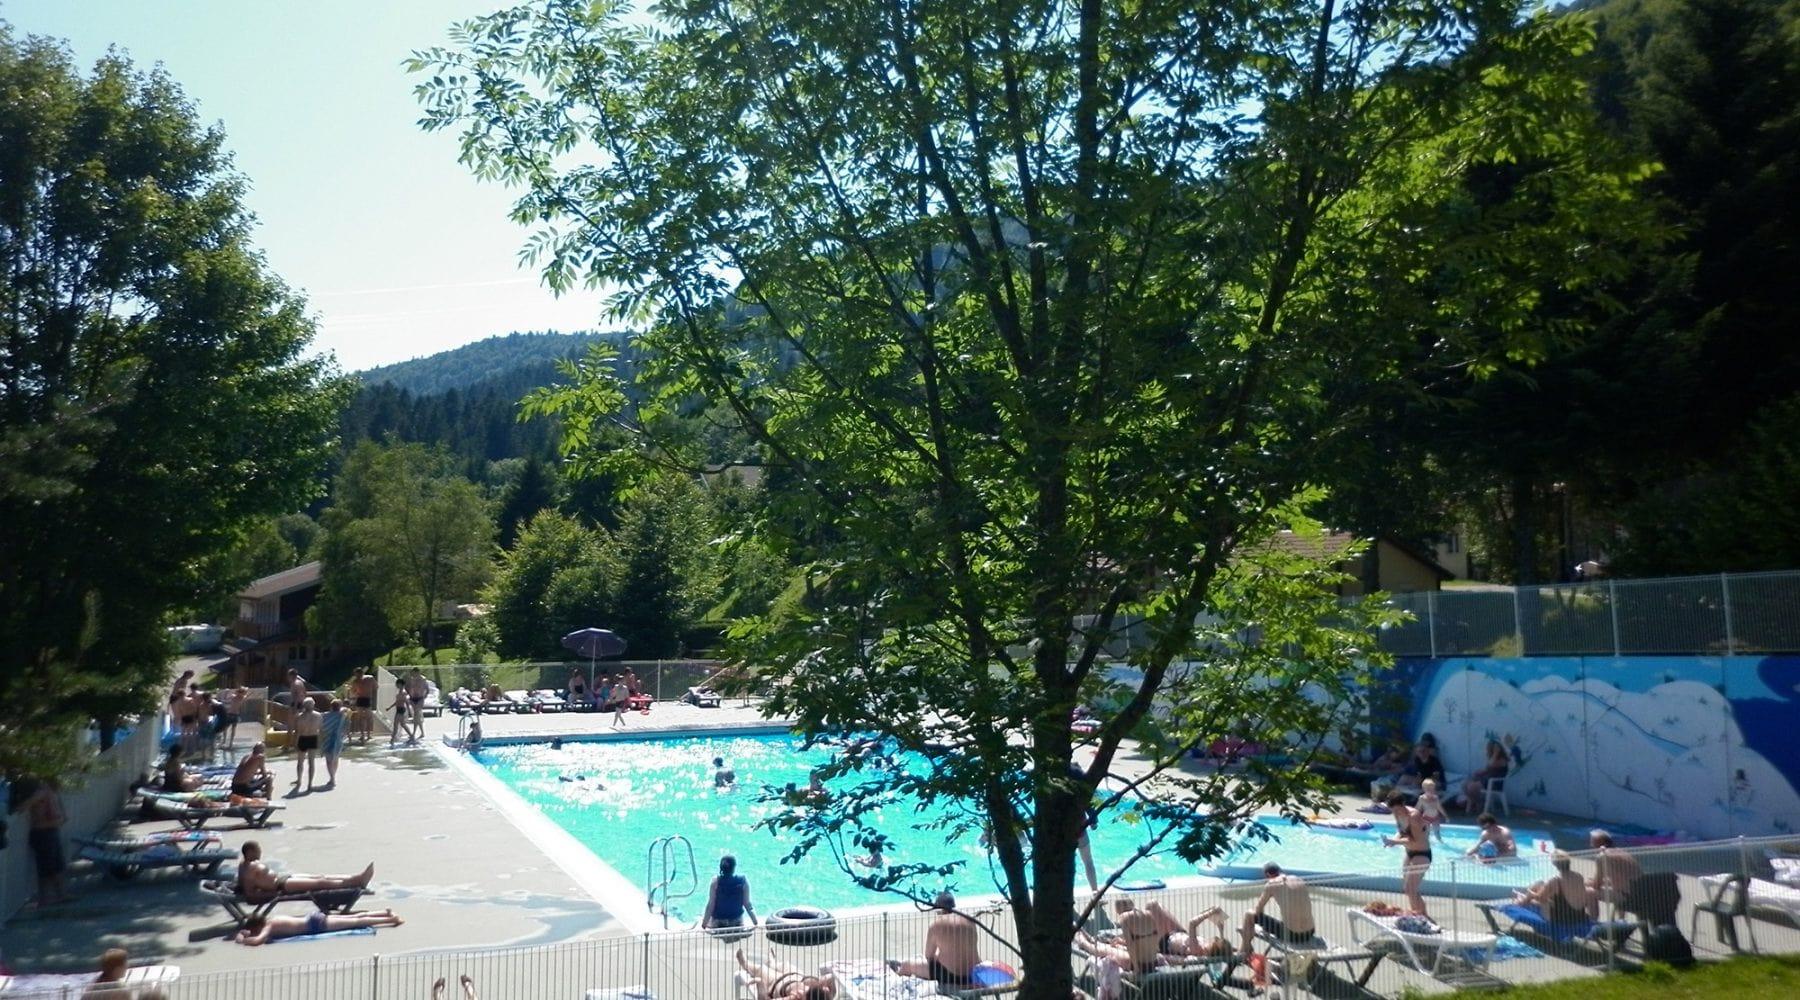 Camping Vosges   Camping Belle Hutte La Bresse Proche Gerardmer pour Camping Gérardmer Avec Piscine